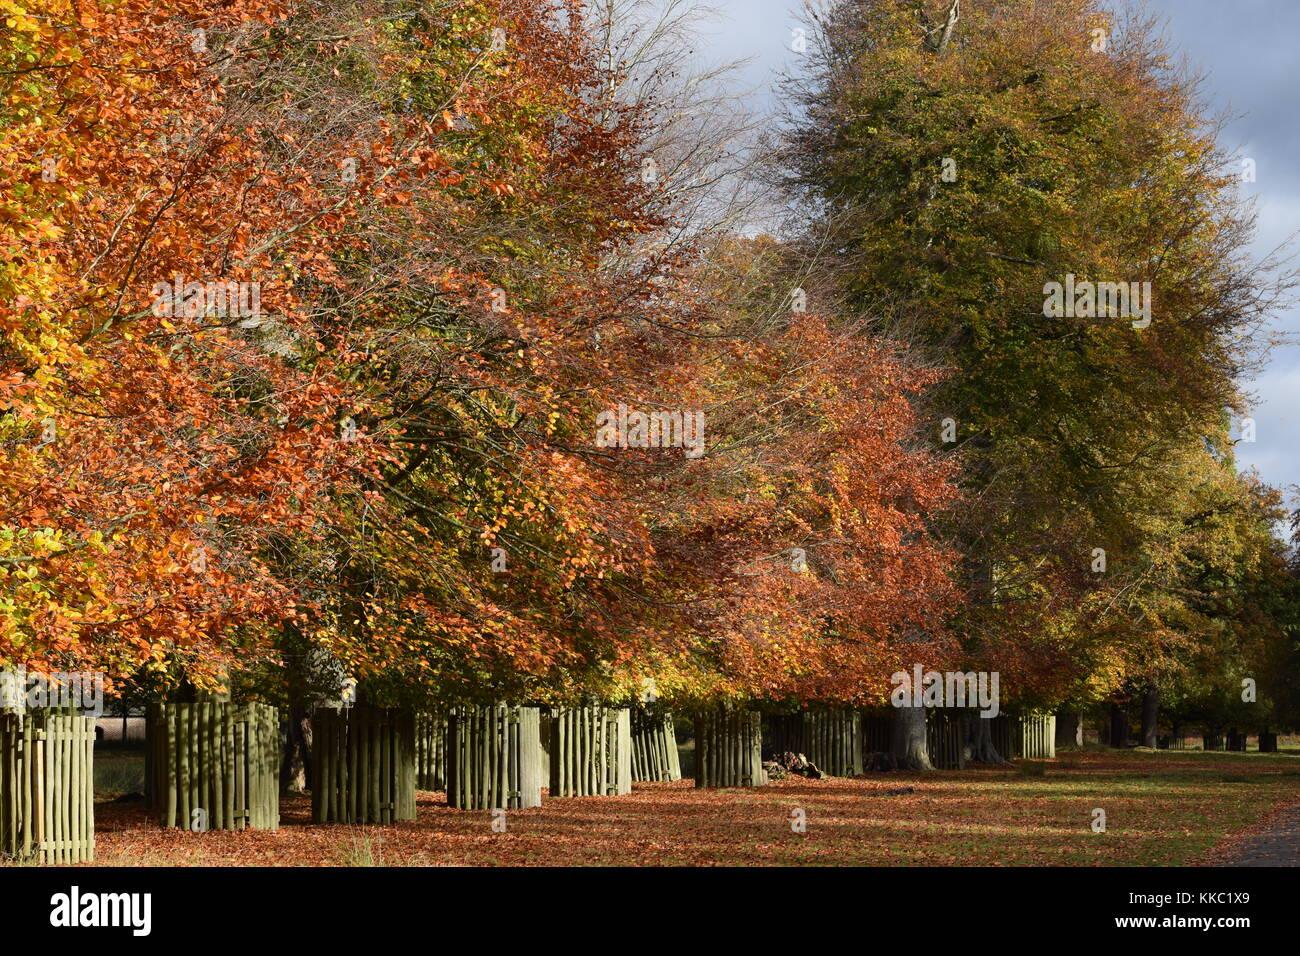 Dunham Massey Orange Autumn Leaves on Trees - Stock Image